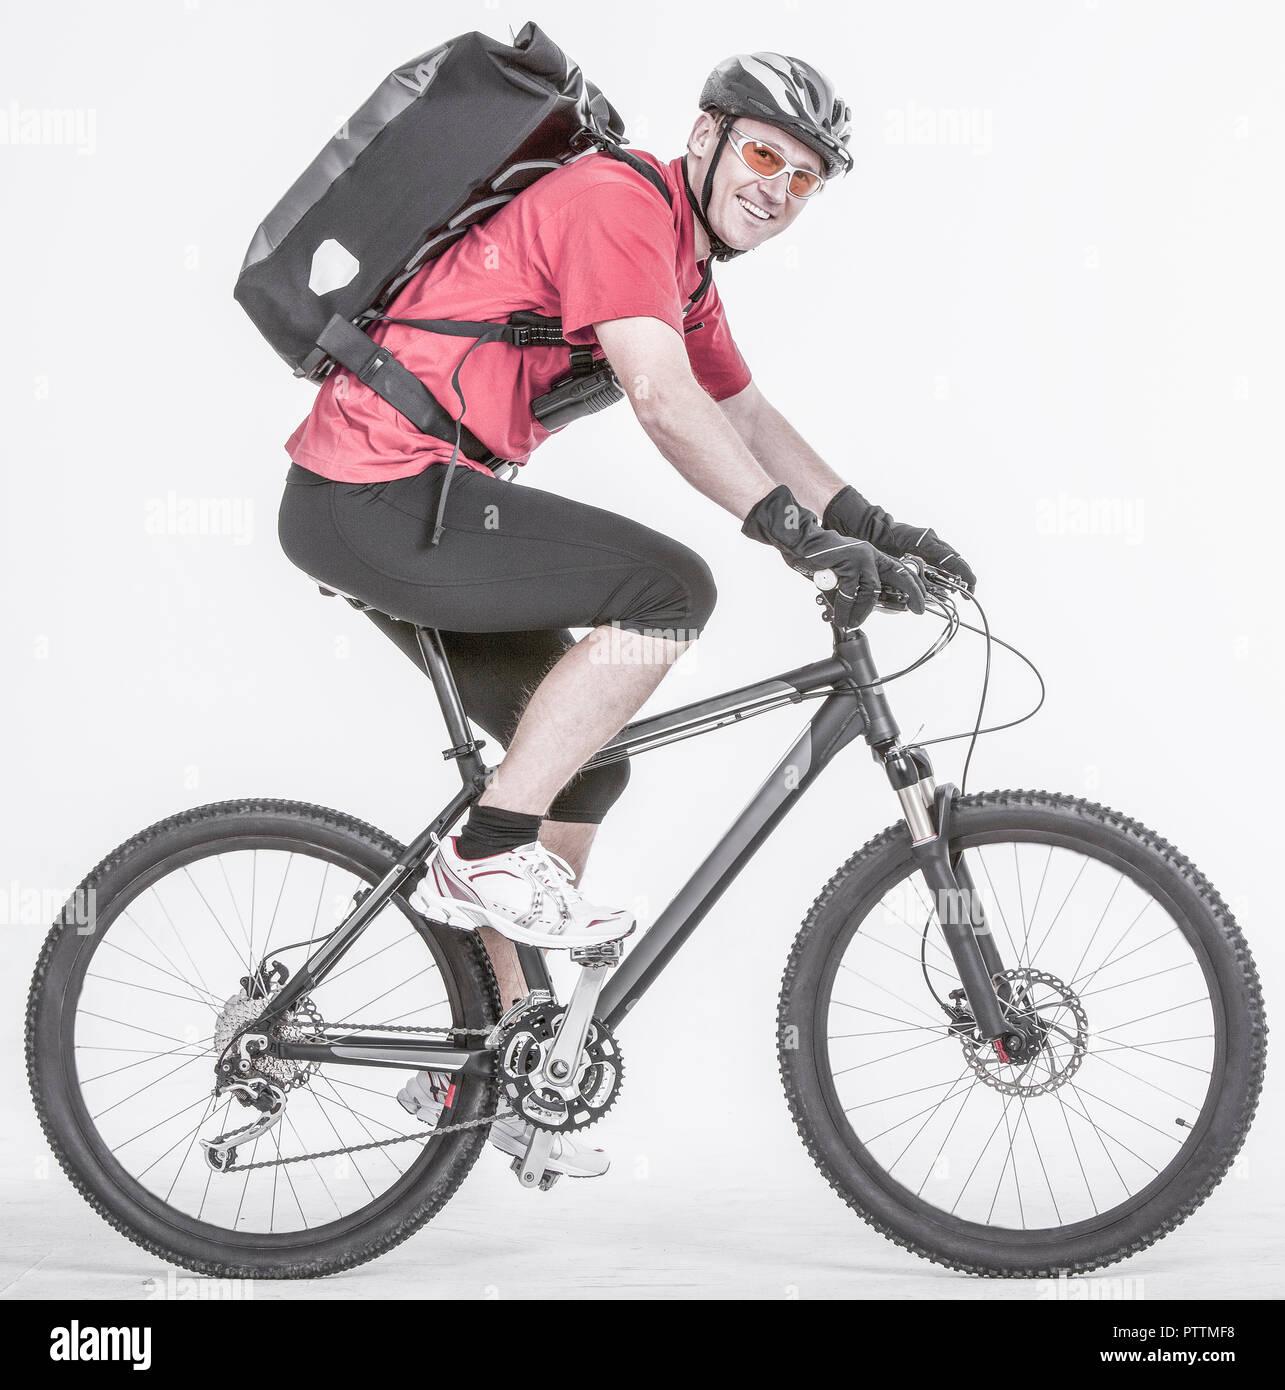 Fahrradkurier auf Rad (model-released) Stock Photo